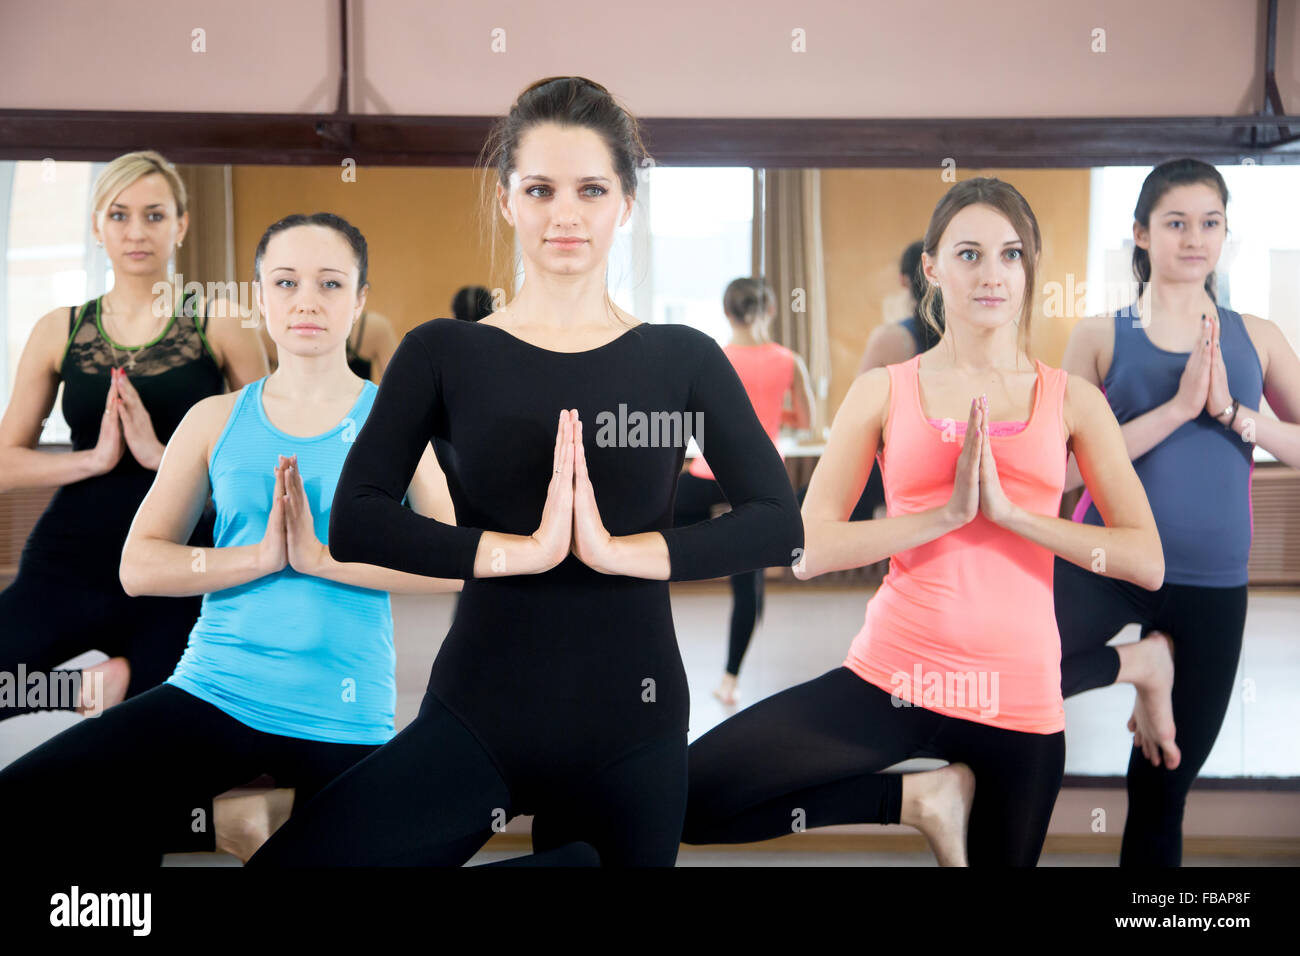 Sporty yogi girls in class in Yoga pose vrikshasana (Vriksasana or Tree Pose) using namaste - Stock Image